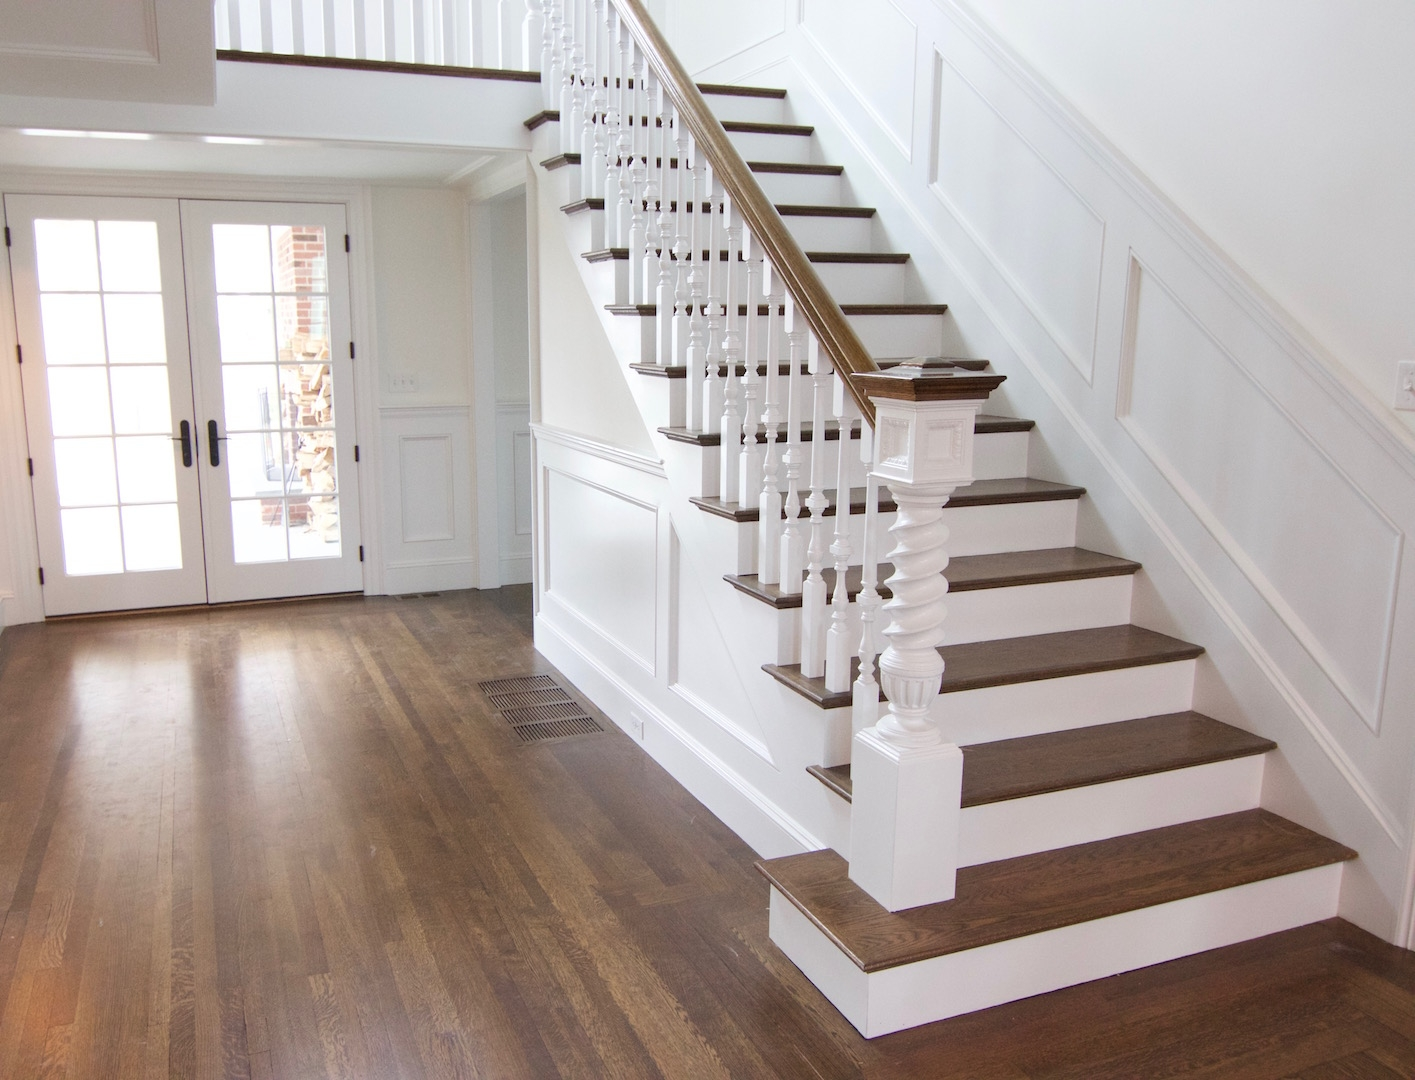 Hardwood Staircases Images Gandswoodfloors | Best Hardwood For Stairs | Treads | Oak | Stair Tread | Stain | Laminate Flooring